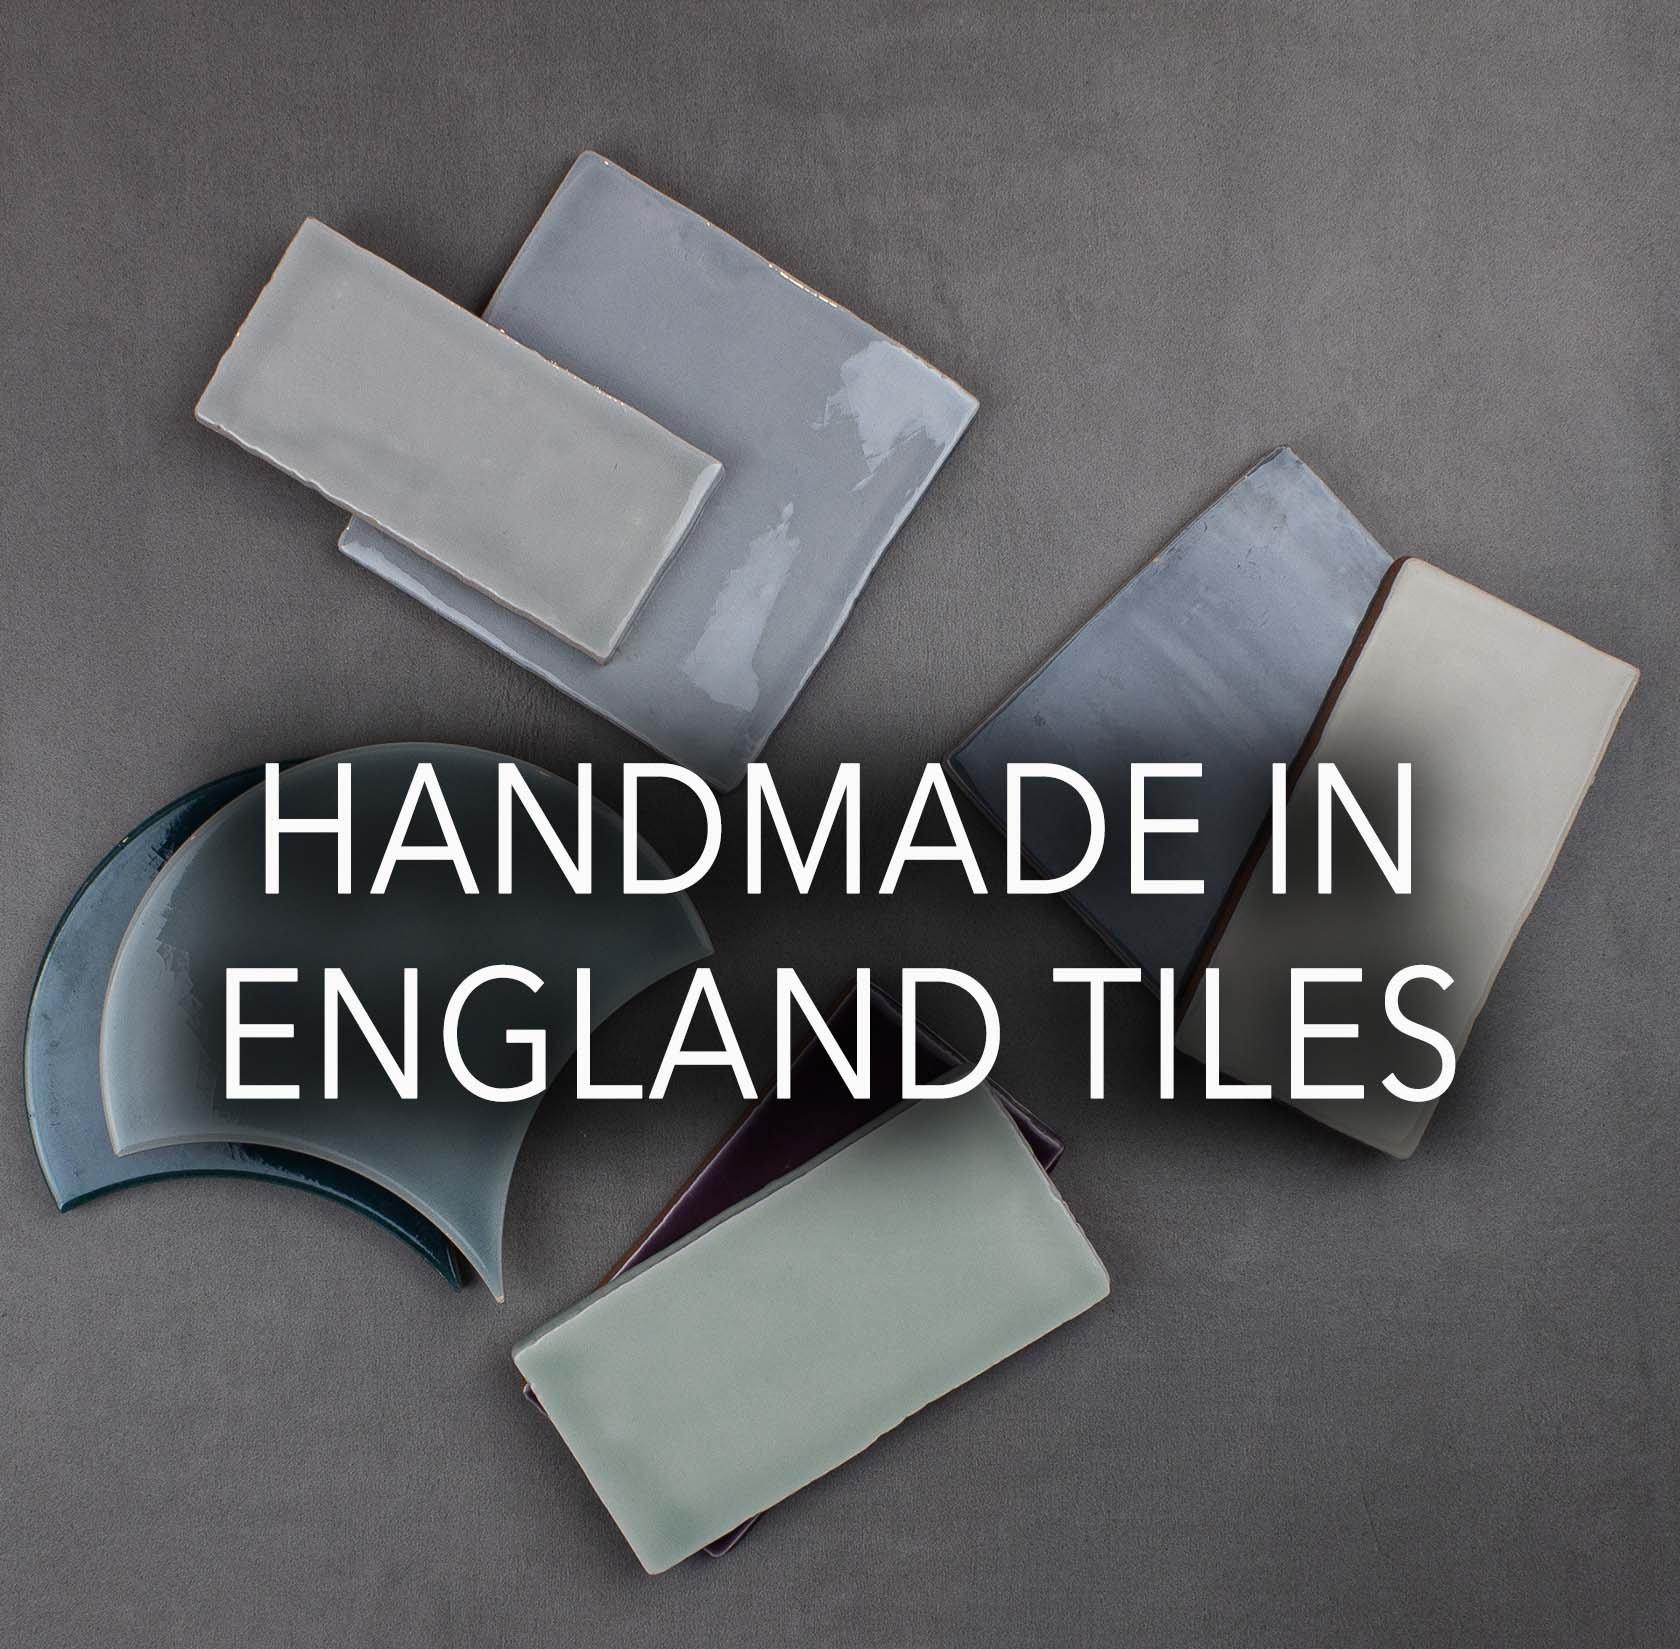 Handmade in England Tiles